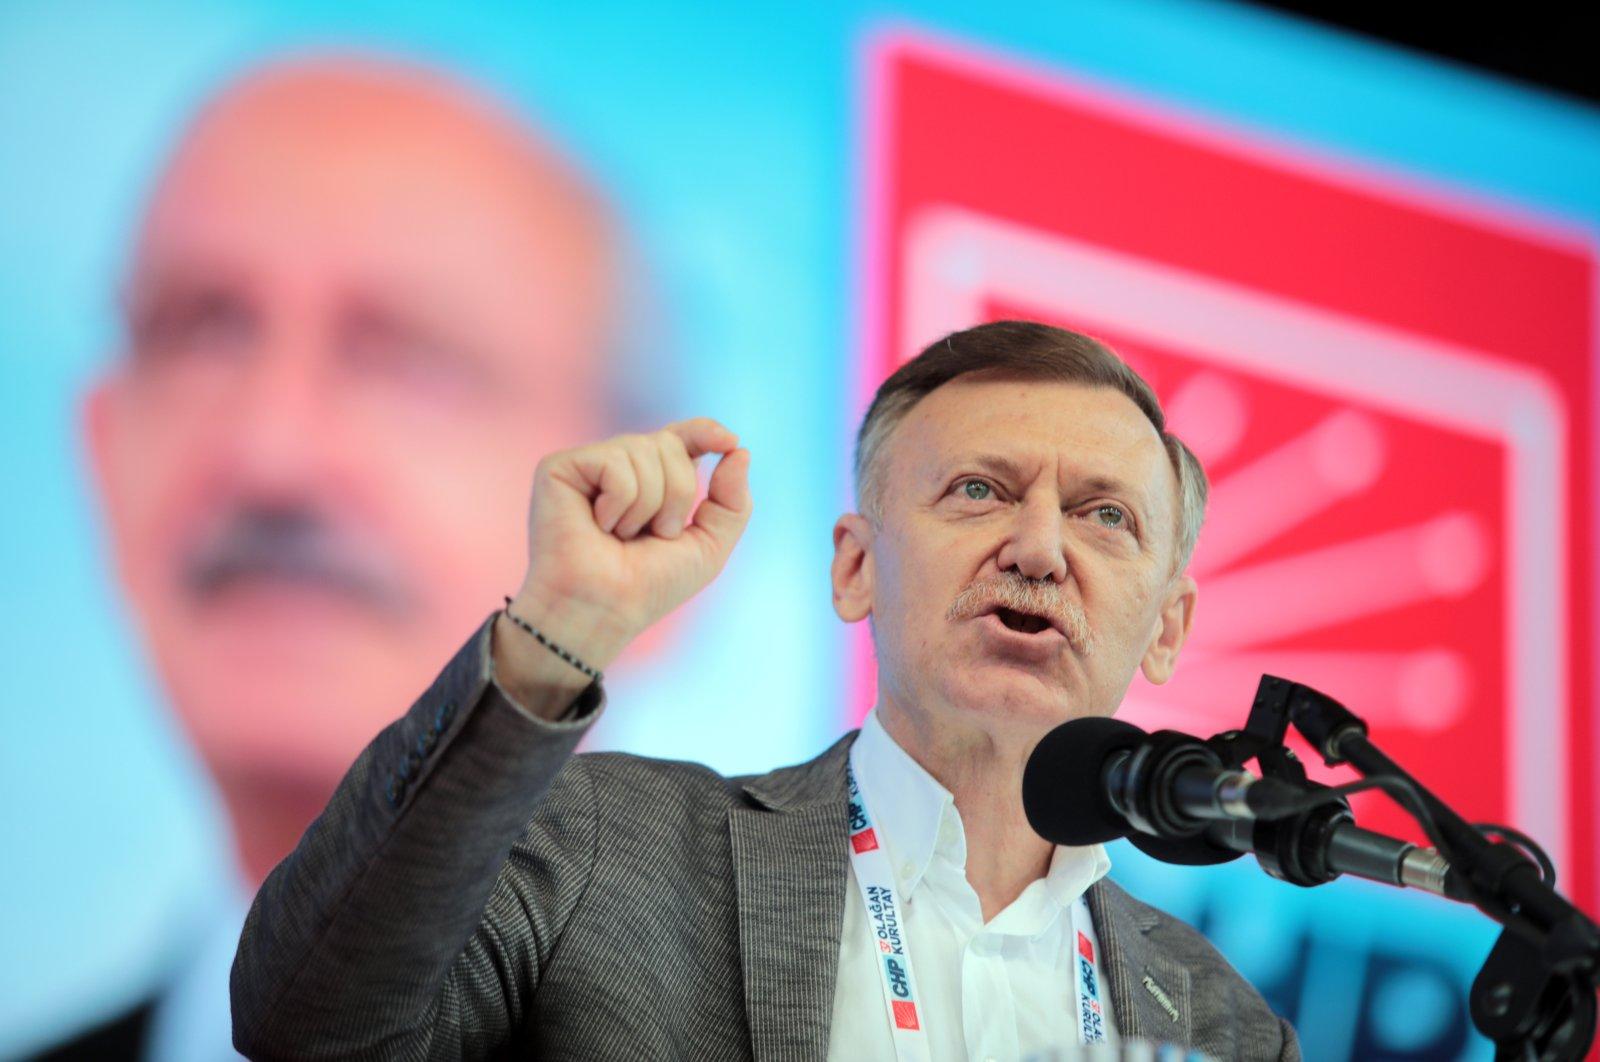 Former CHP deputy Aytuğ Atıcı speaks at the CHP congress, Ankara, Turkey, July 25, 2020. (Photo by Ali Ekeyılmaz)